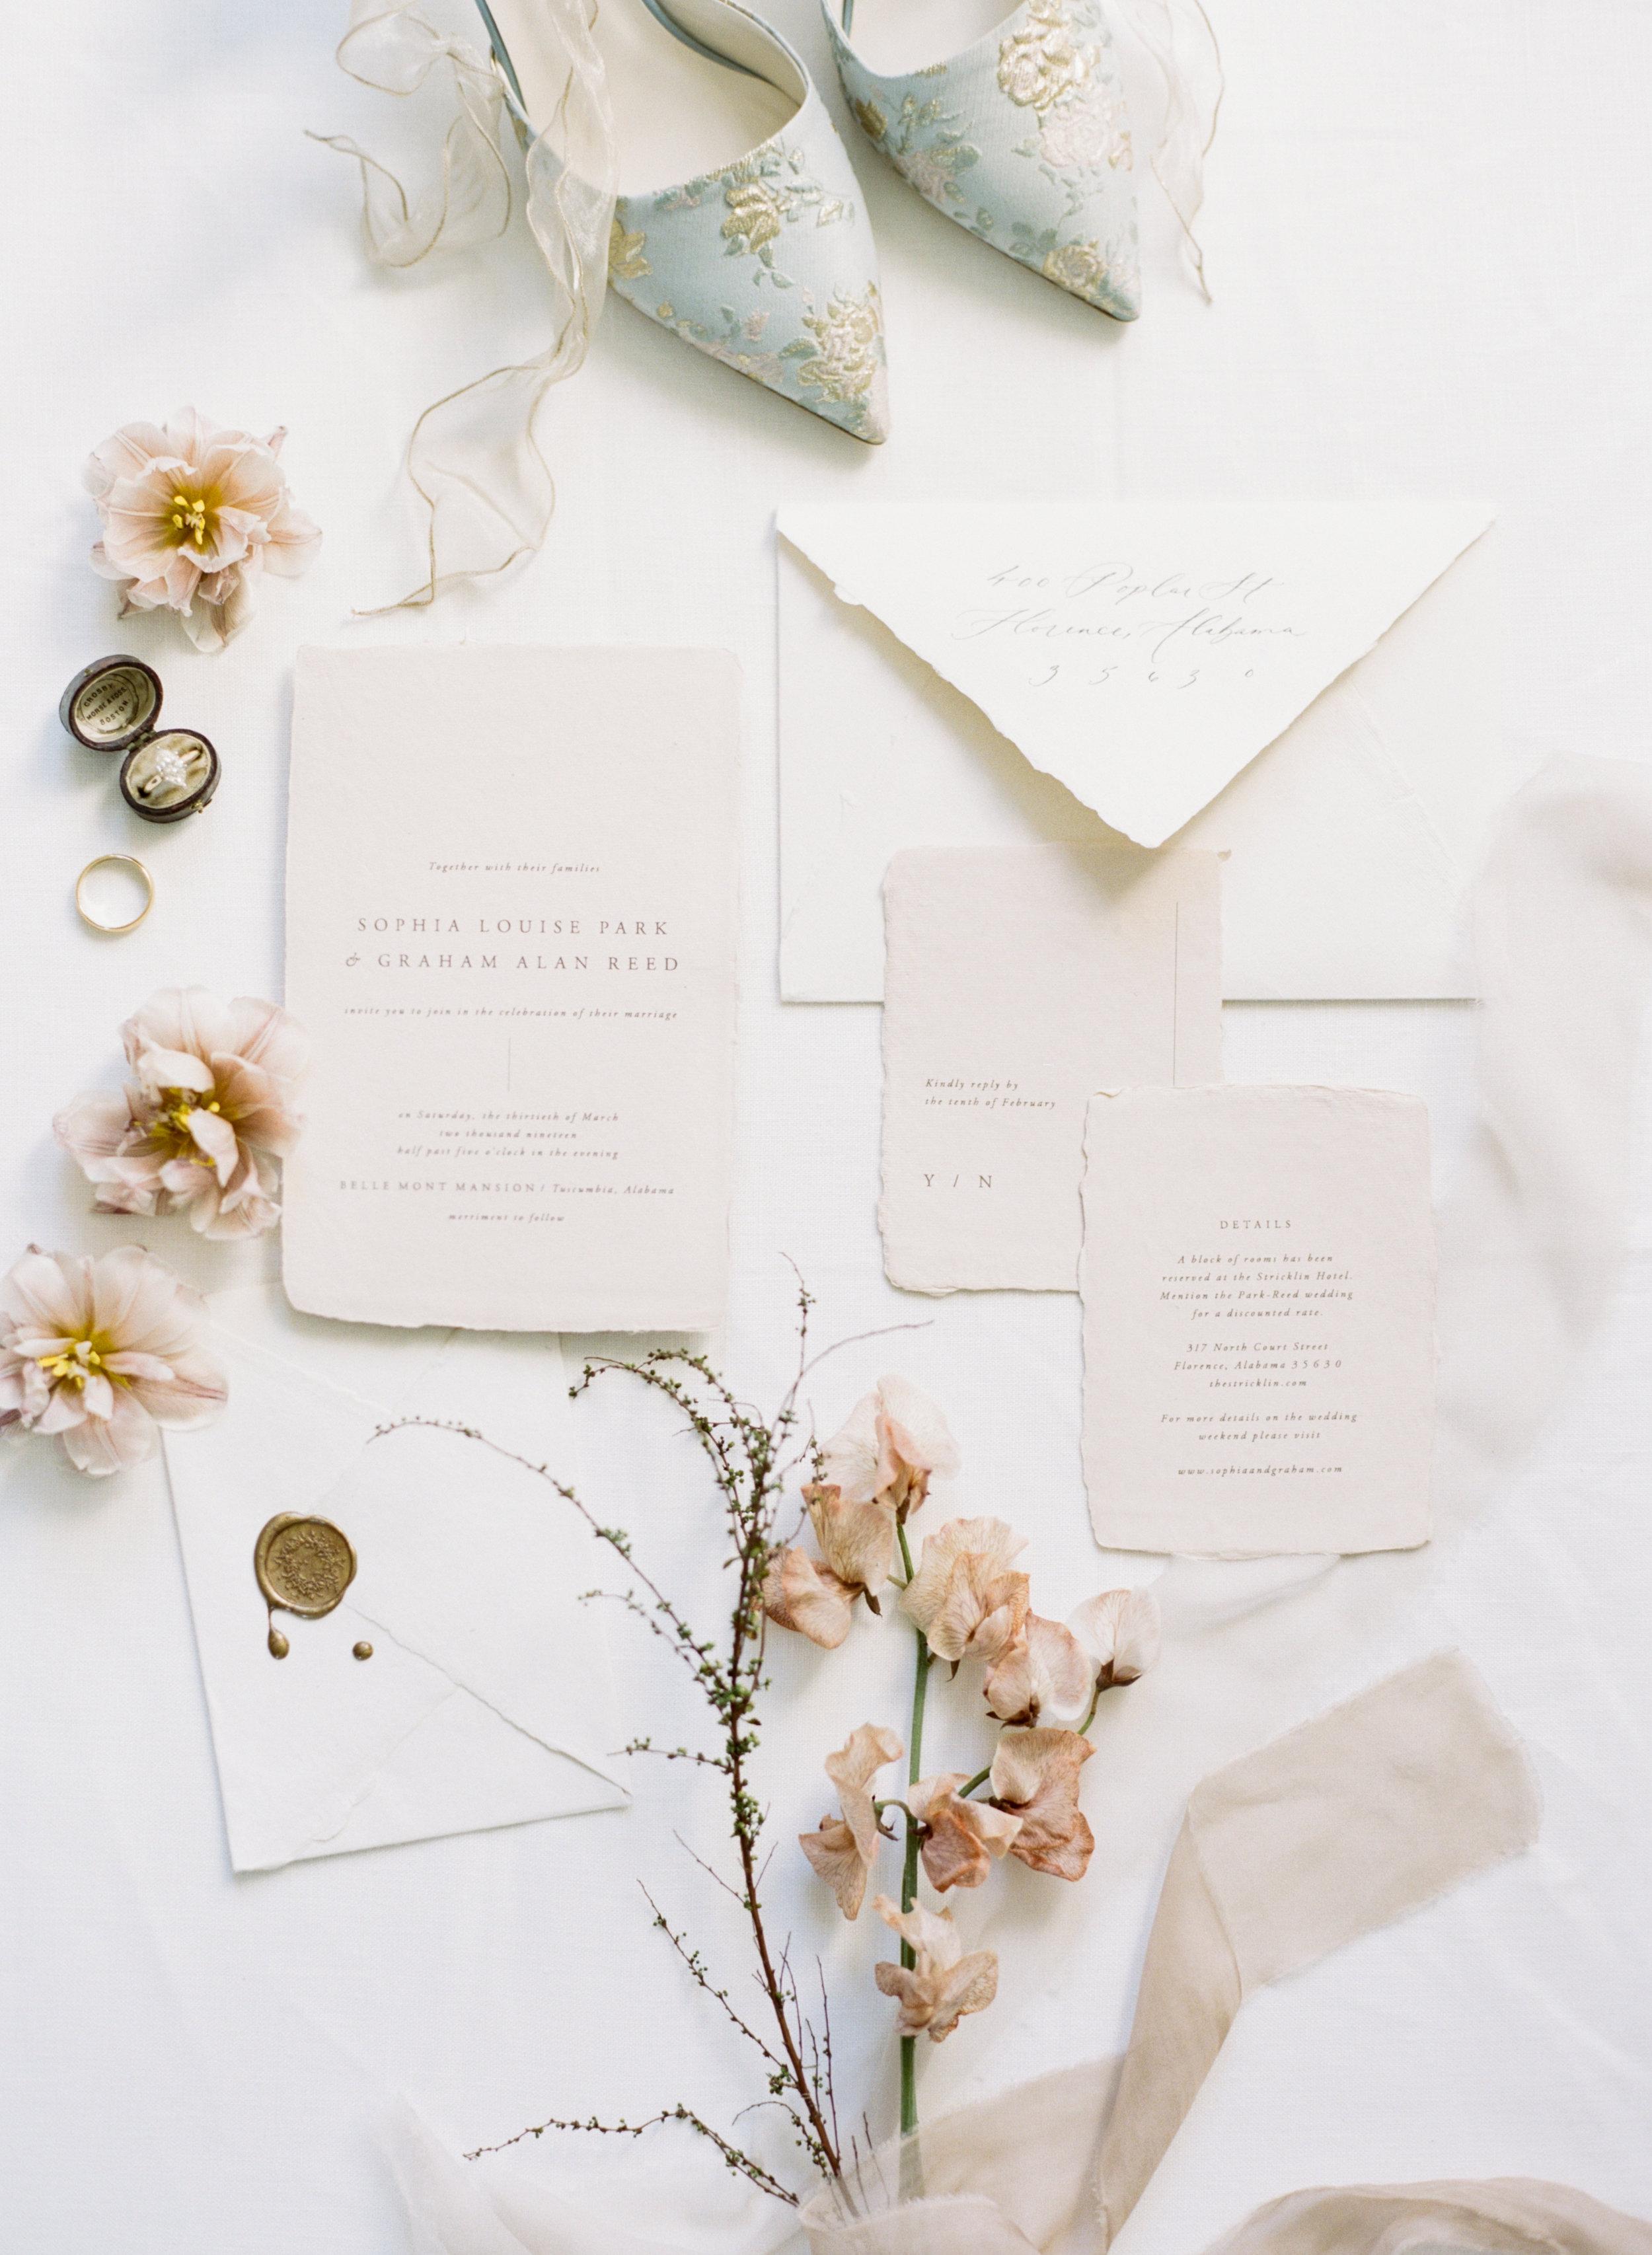 Florence_Alabama_Romantic_Wedding_Invitation (2).jpg